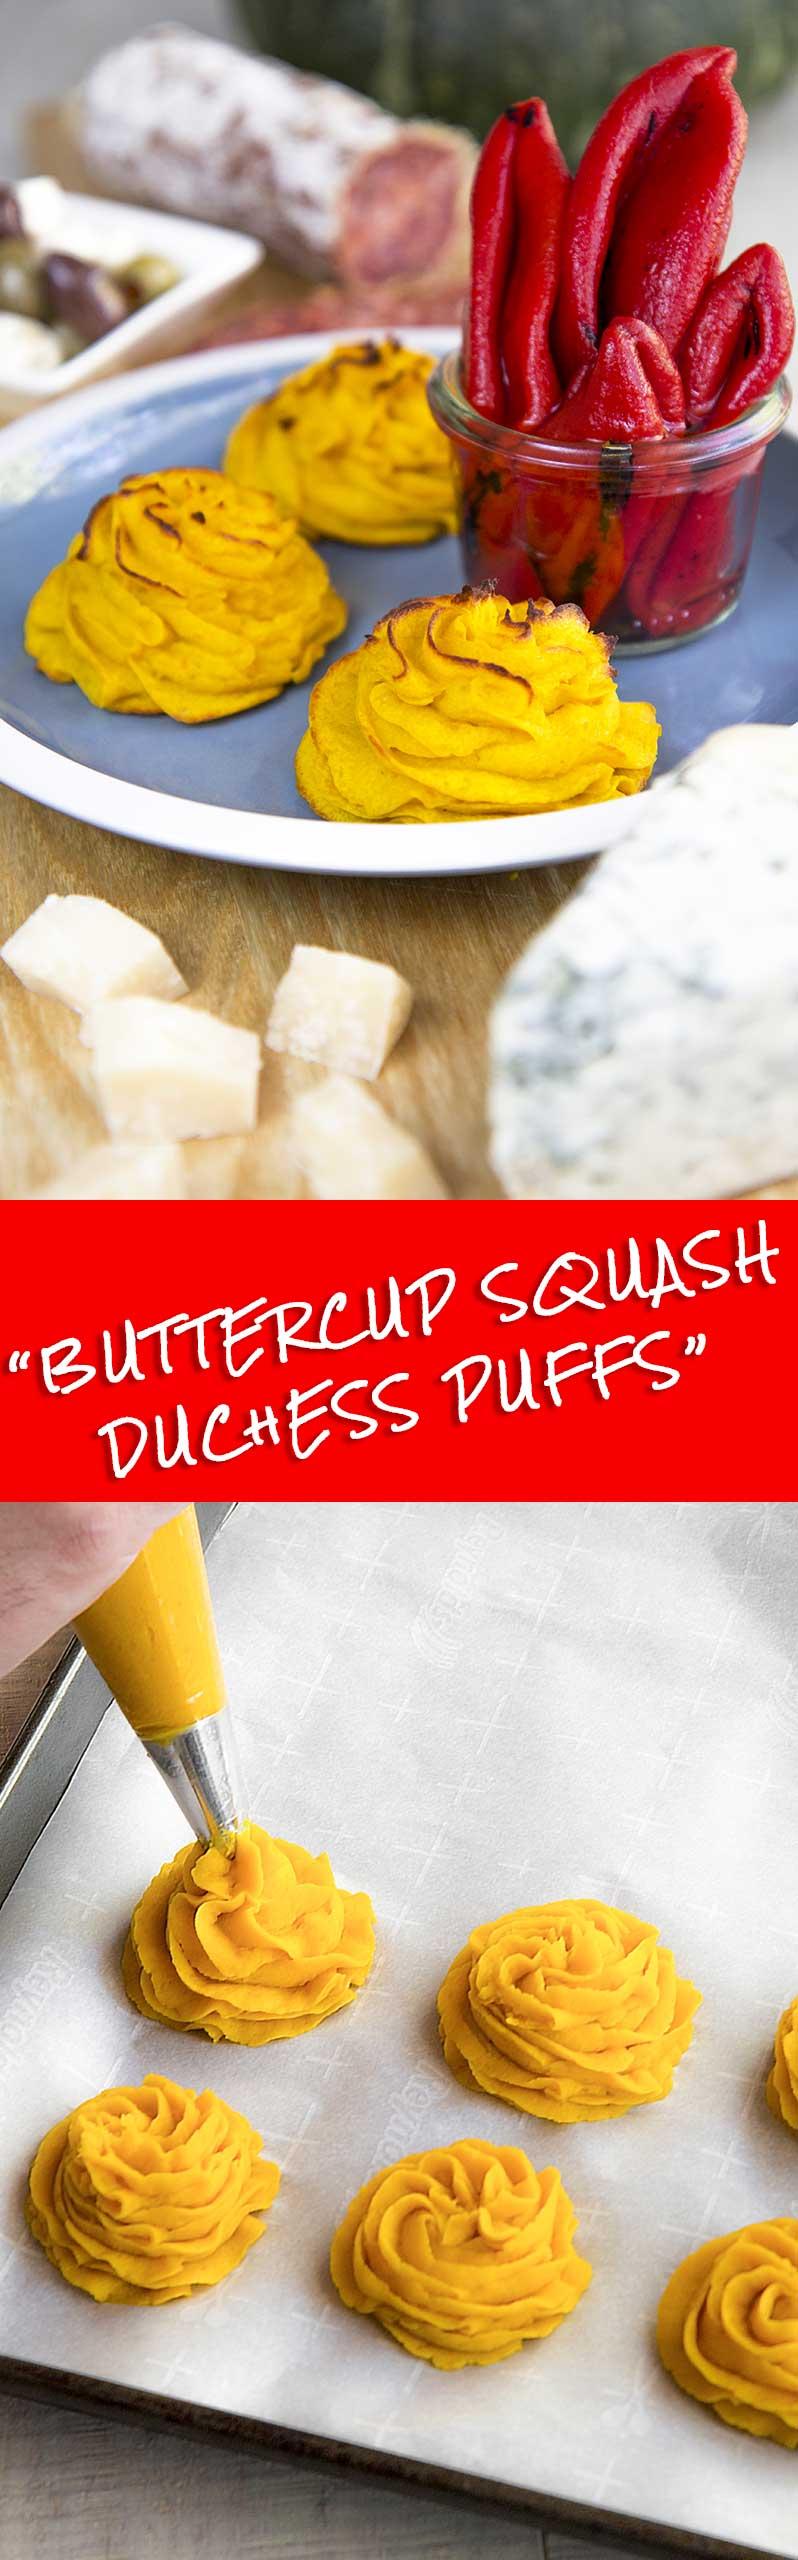 BUTTERCUP SQUASH PUFFS Duchess potatoes style